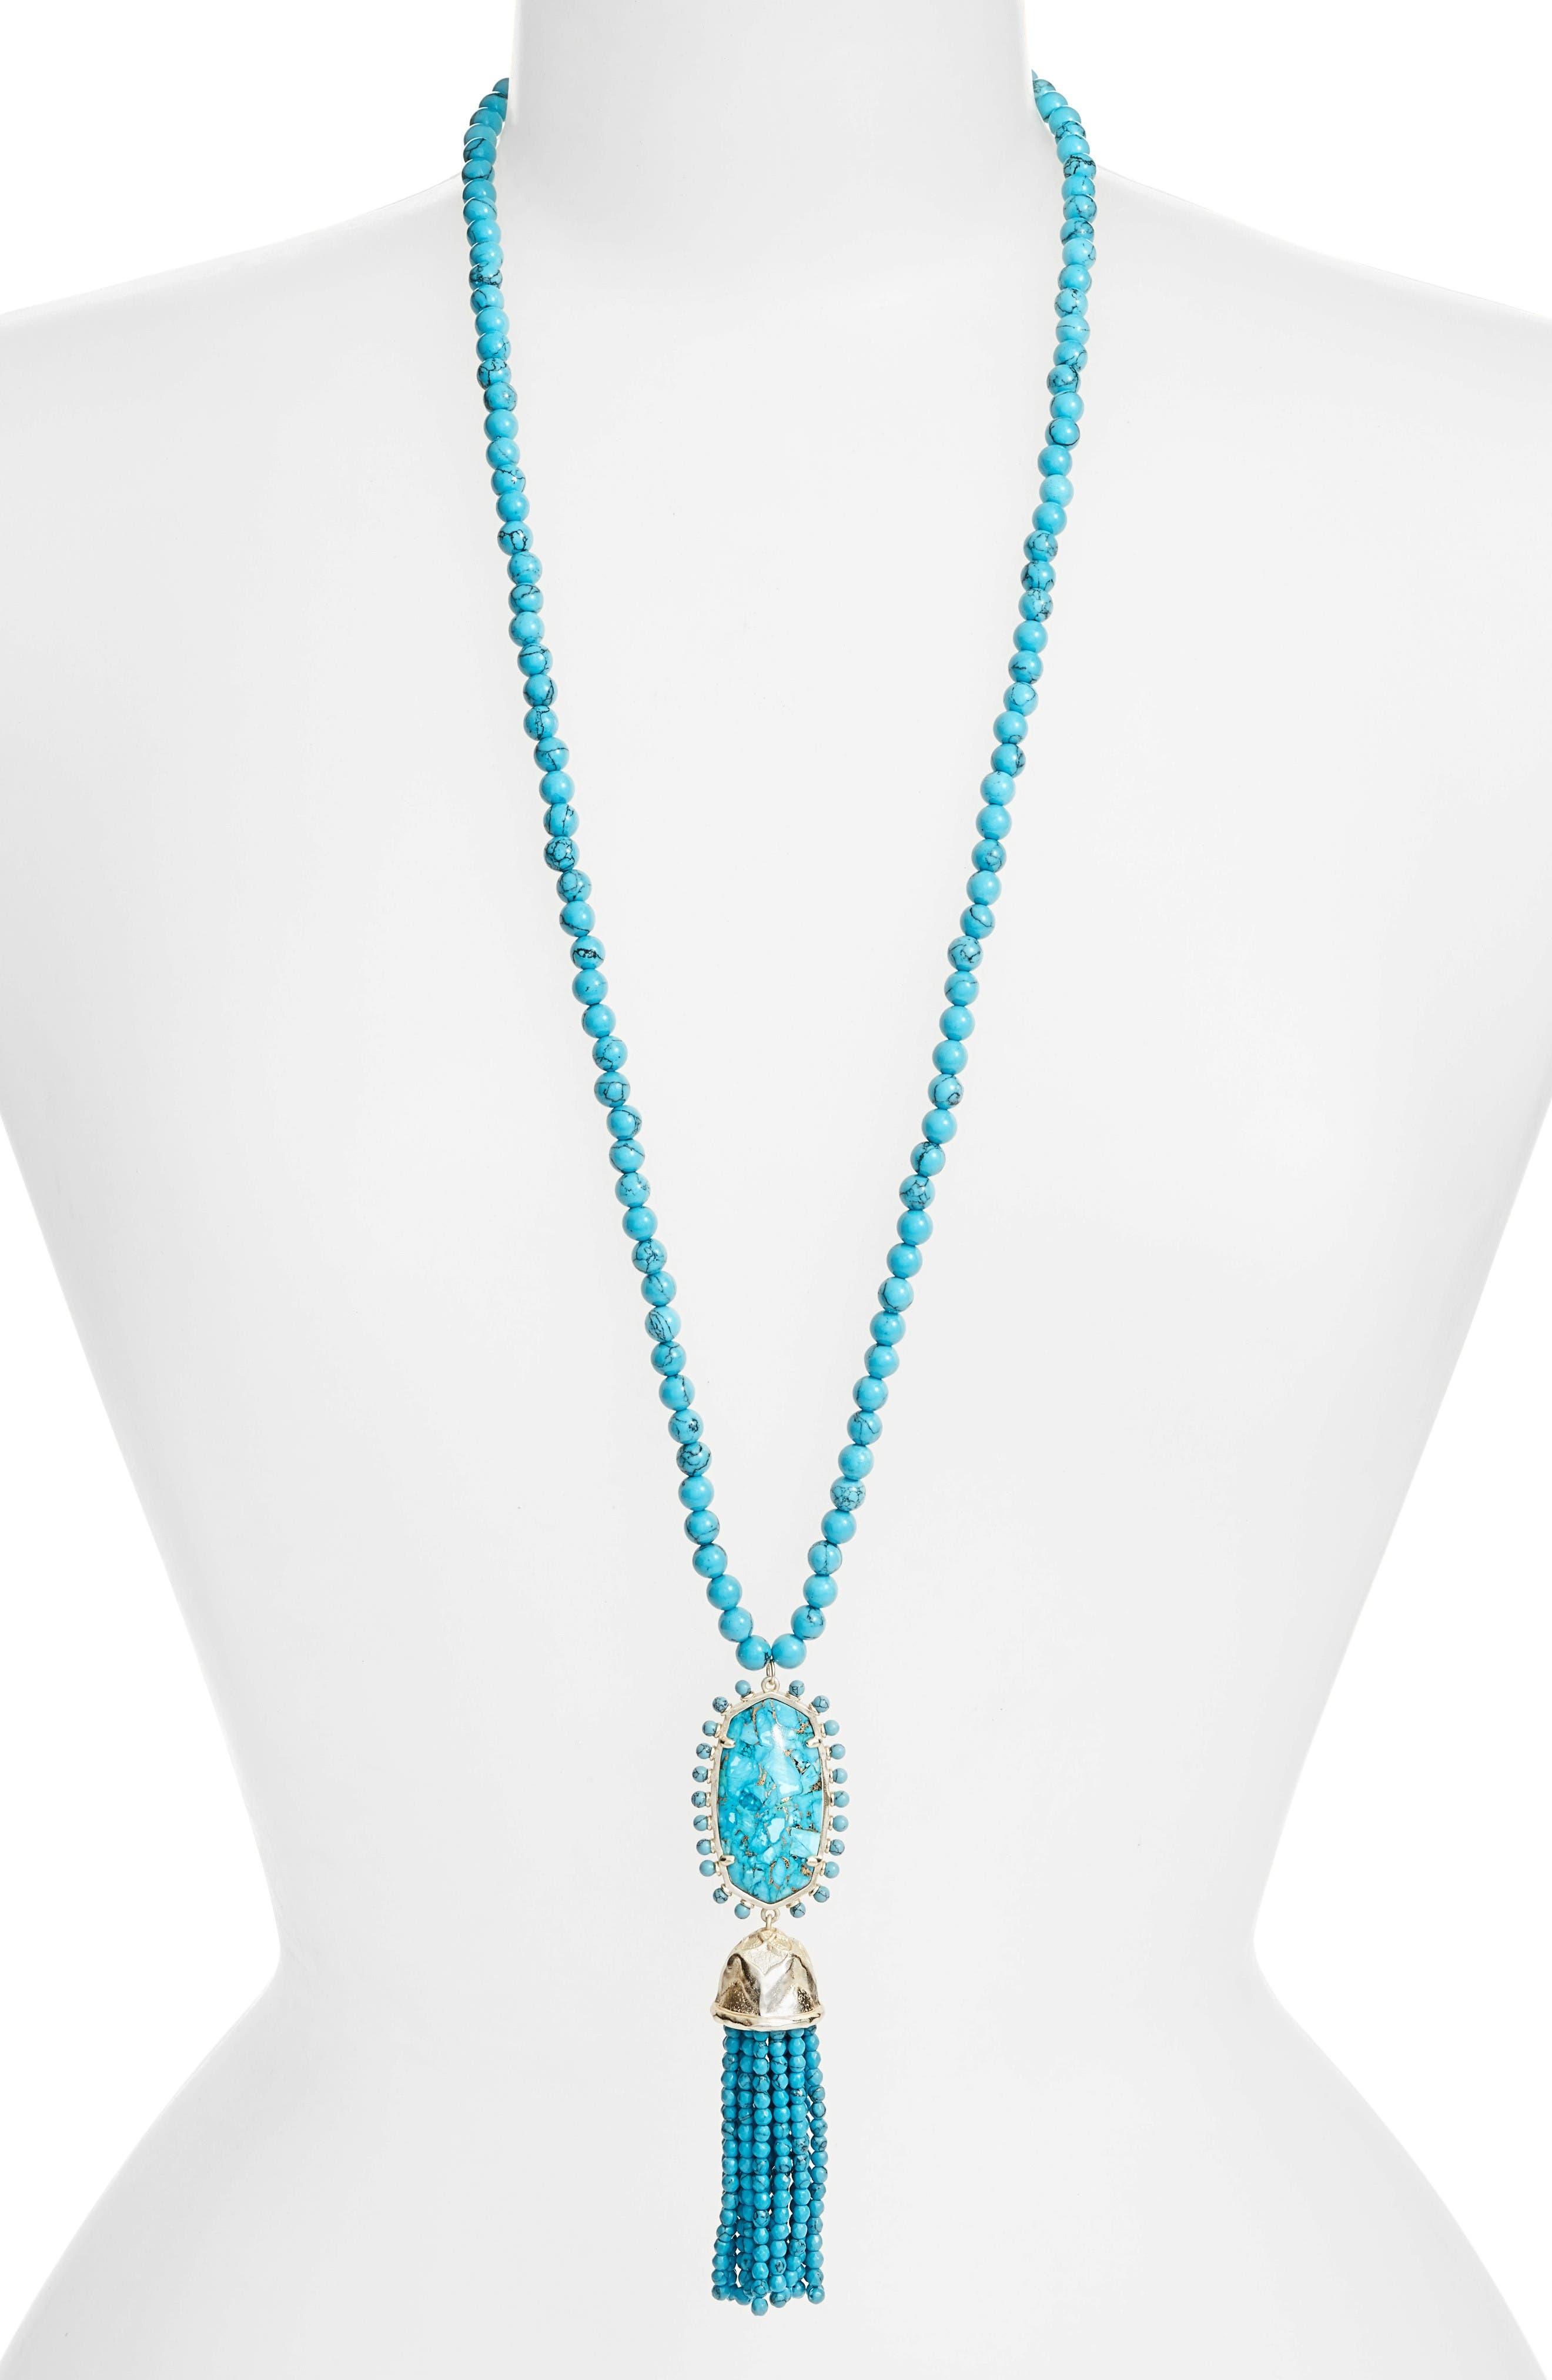 Alternate Image 1 Selected - Kendra Scott Tatiana Pendant Necklace